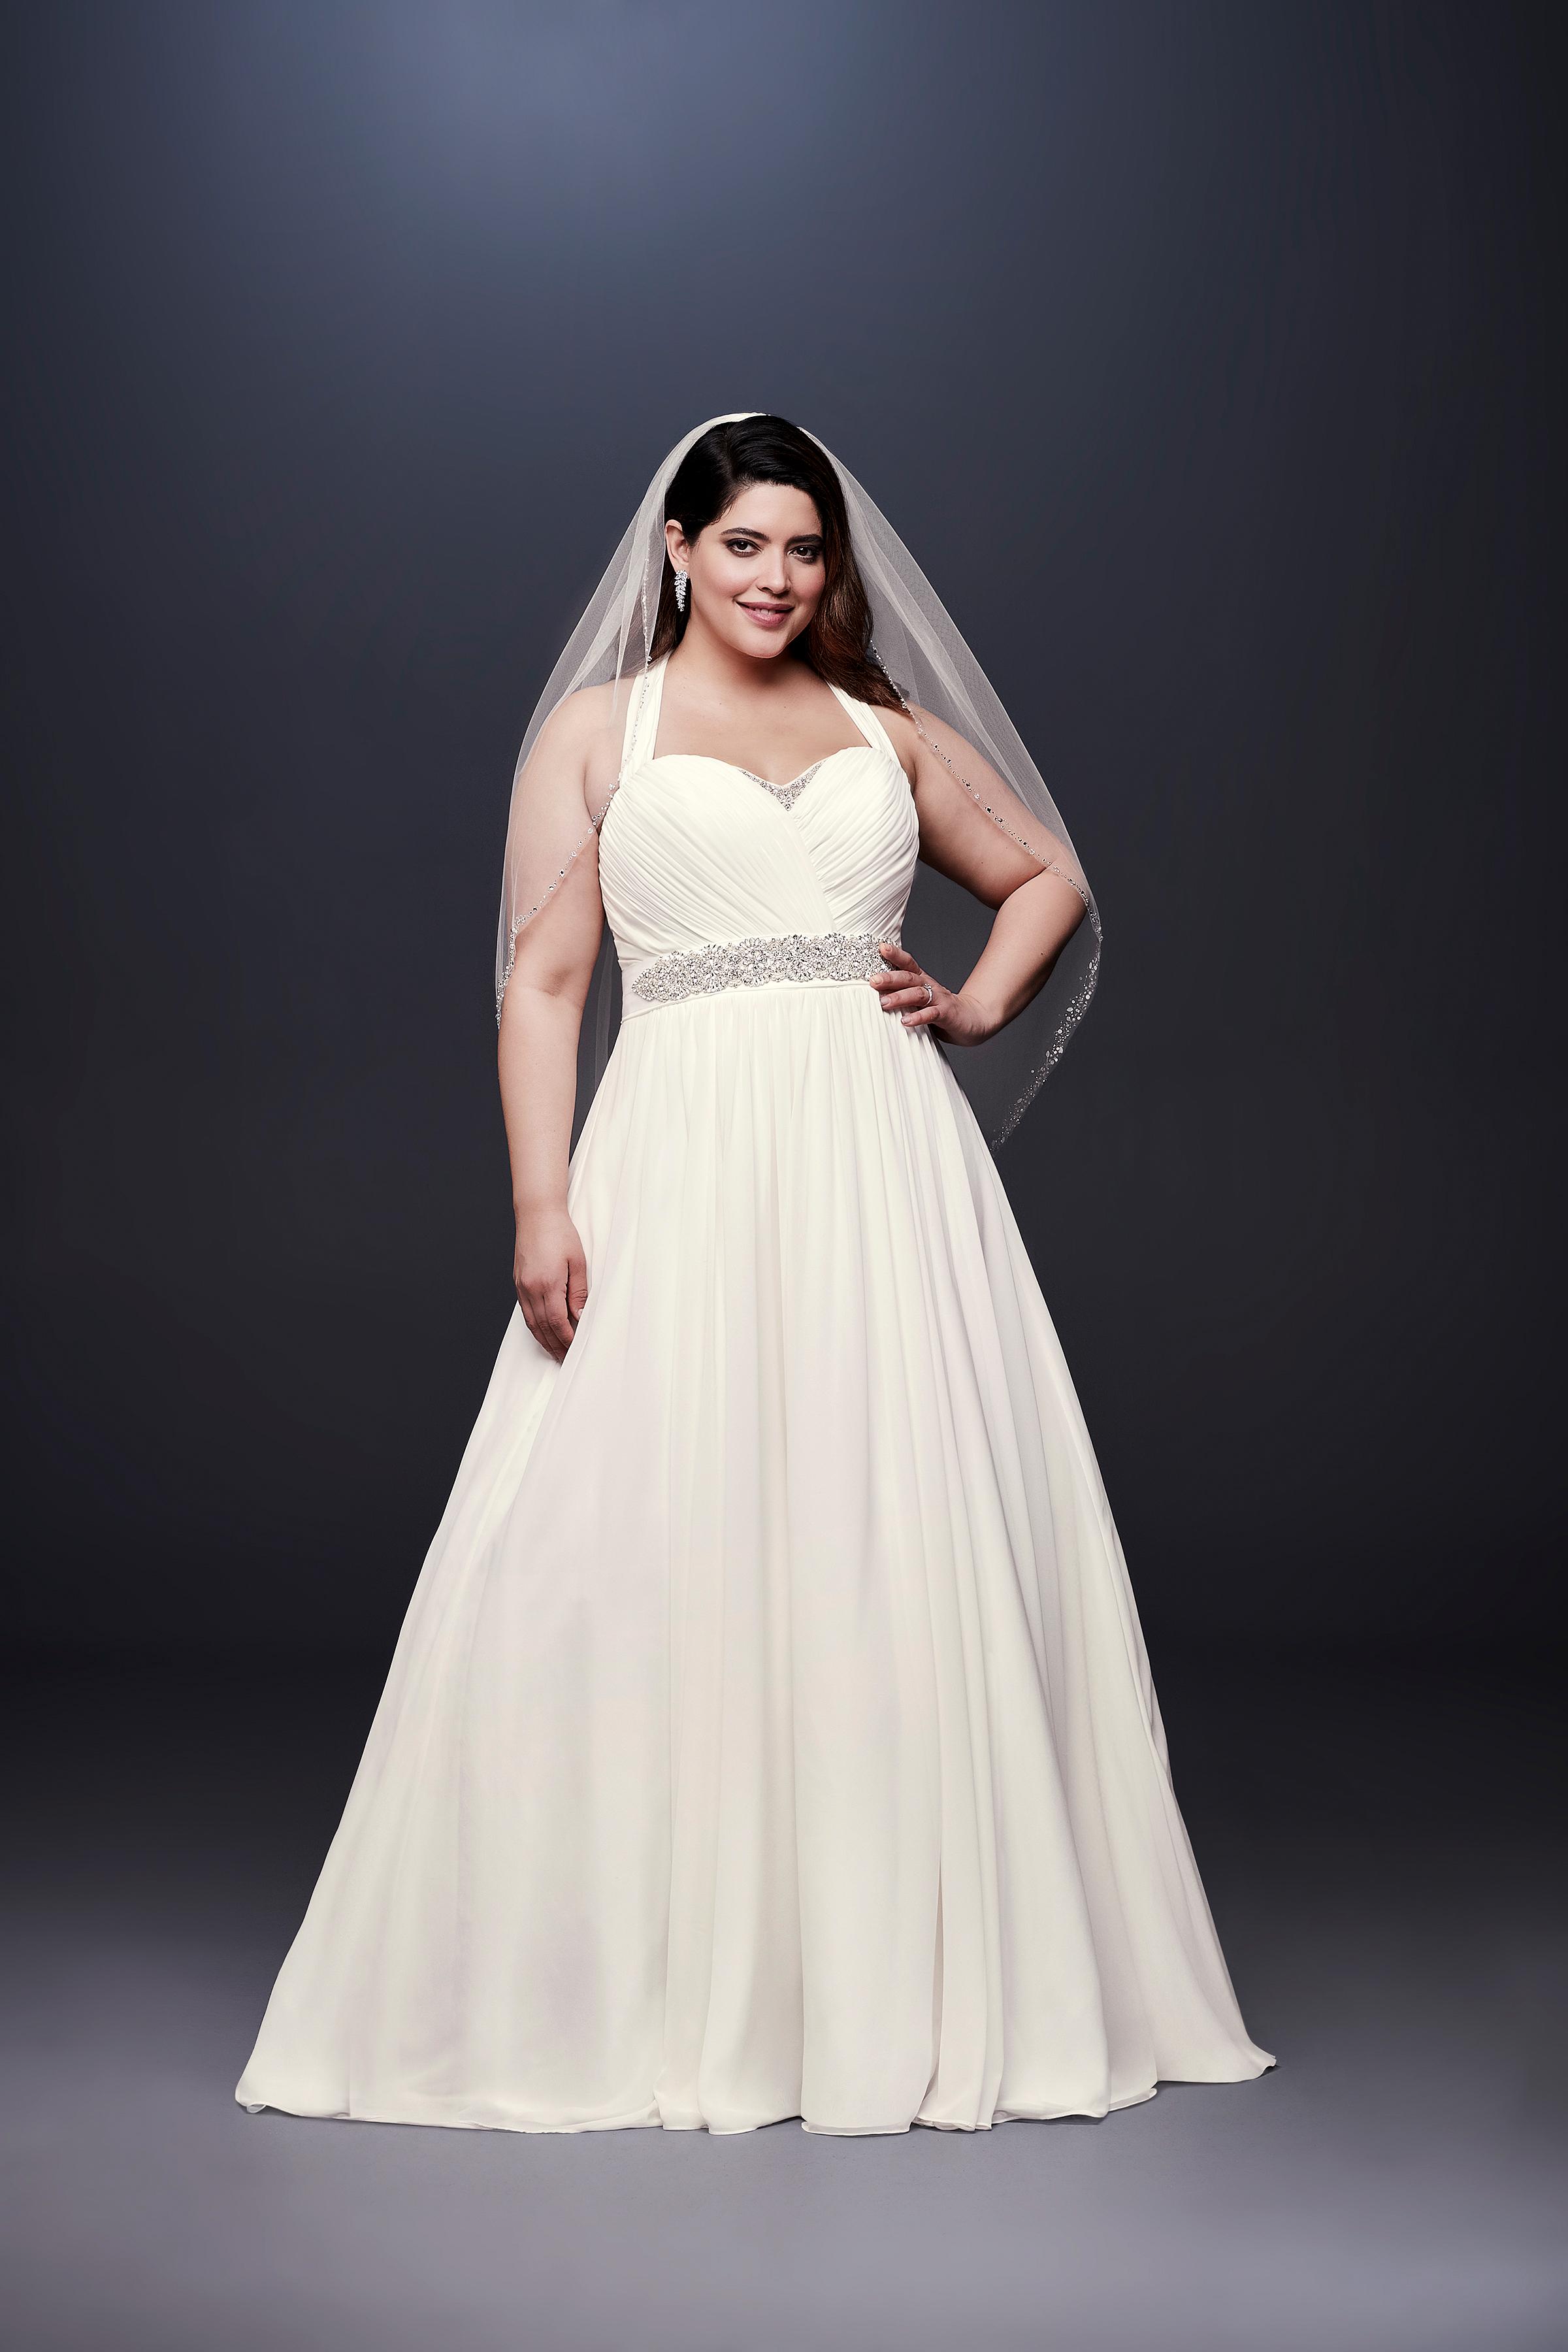 david bridal wedding dress spring 2019 halter a-line beaded belt